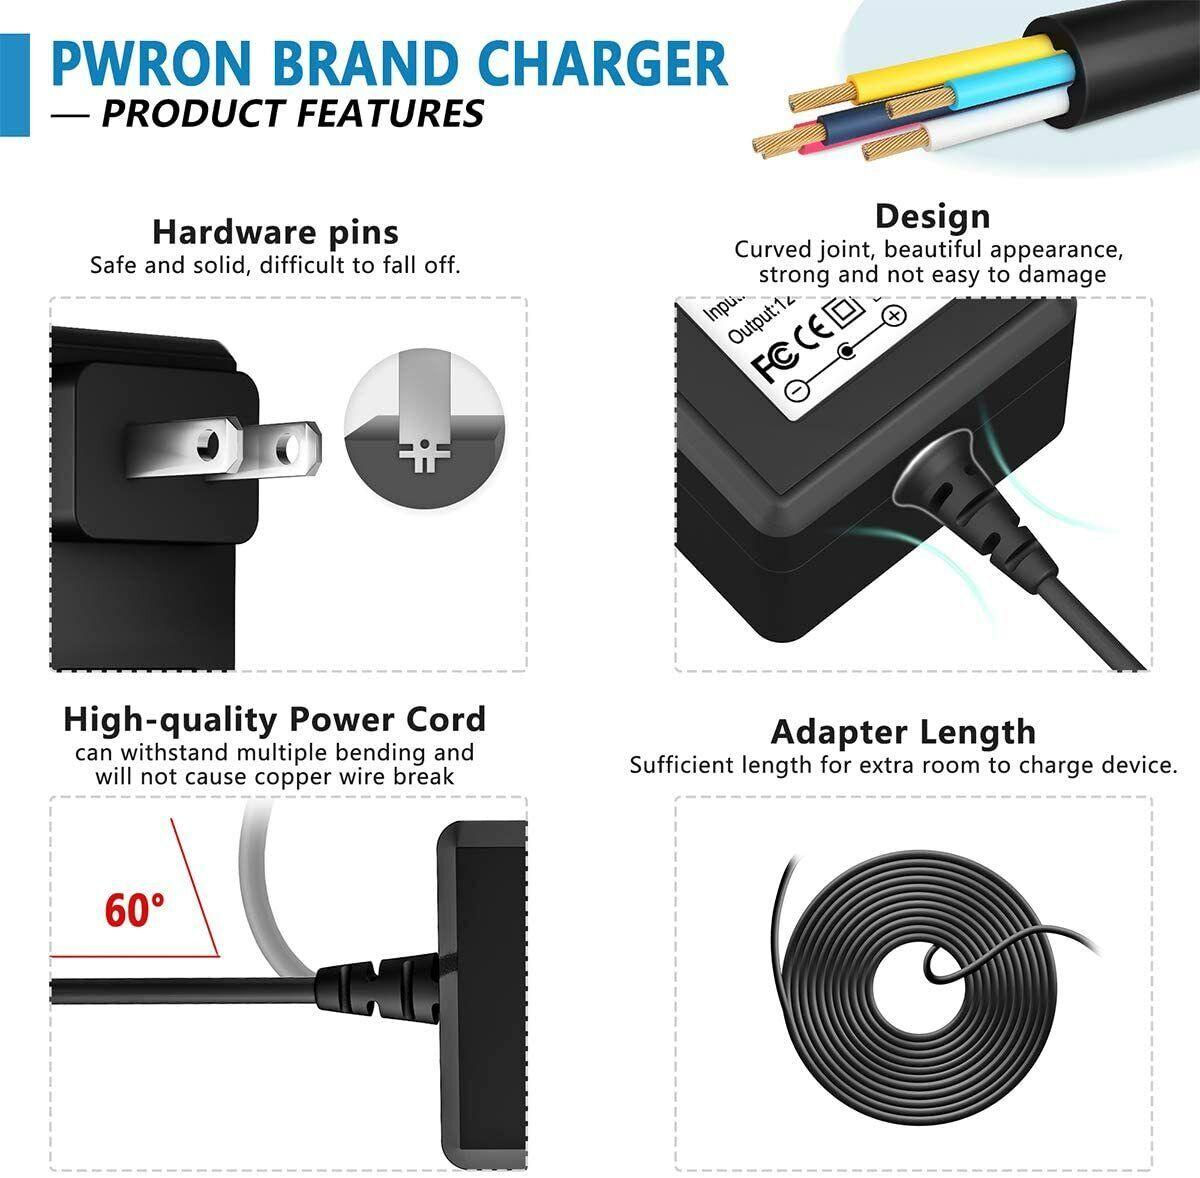 PwrON AC Adapter Charger For MTD Troy Bilt Yard Man 725-06121A Lawn Mower 12V1A